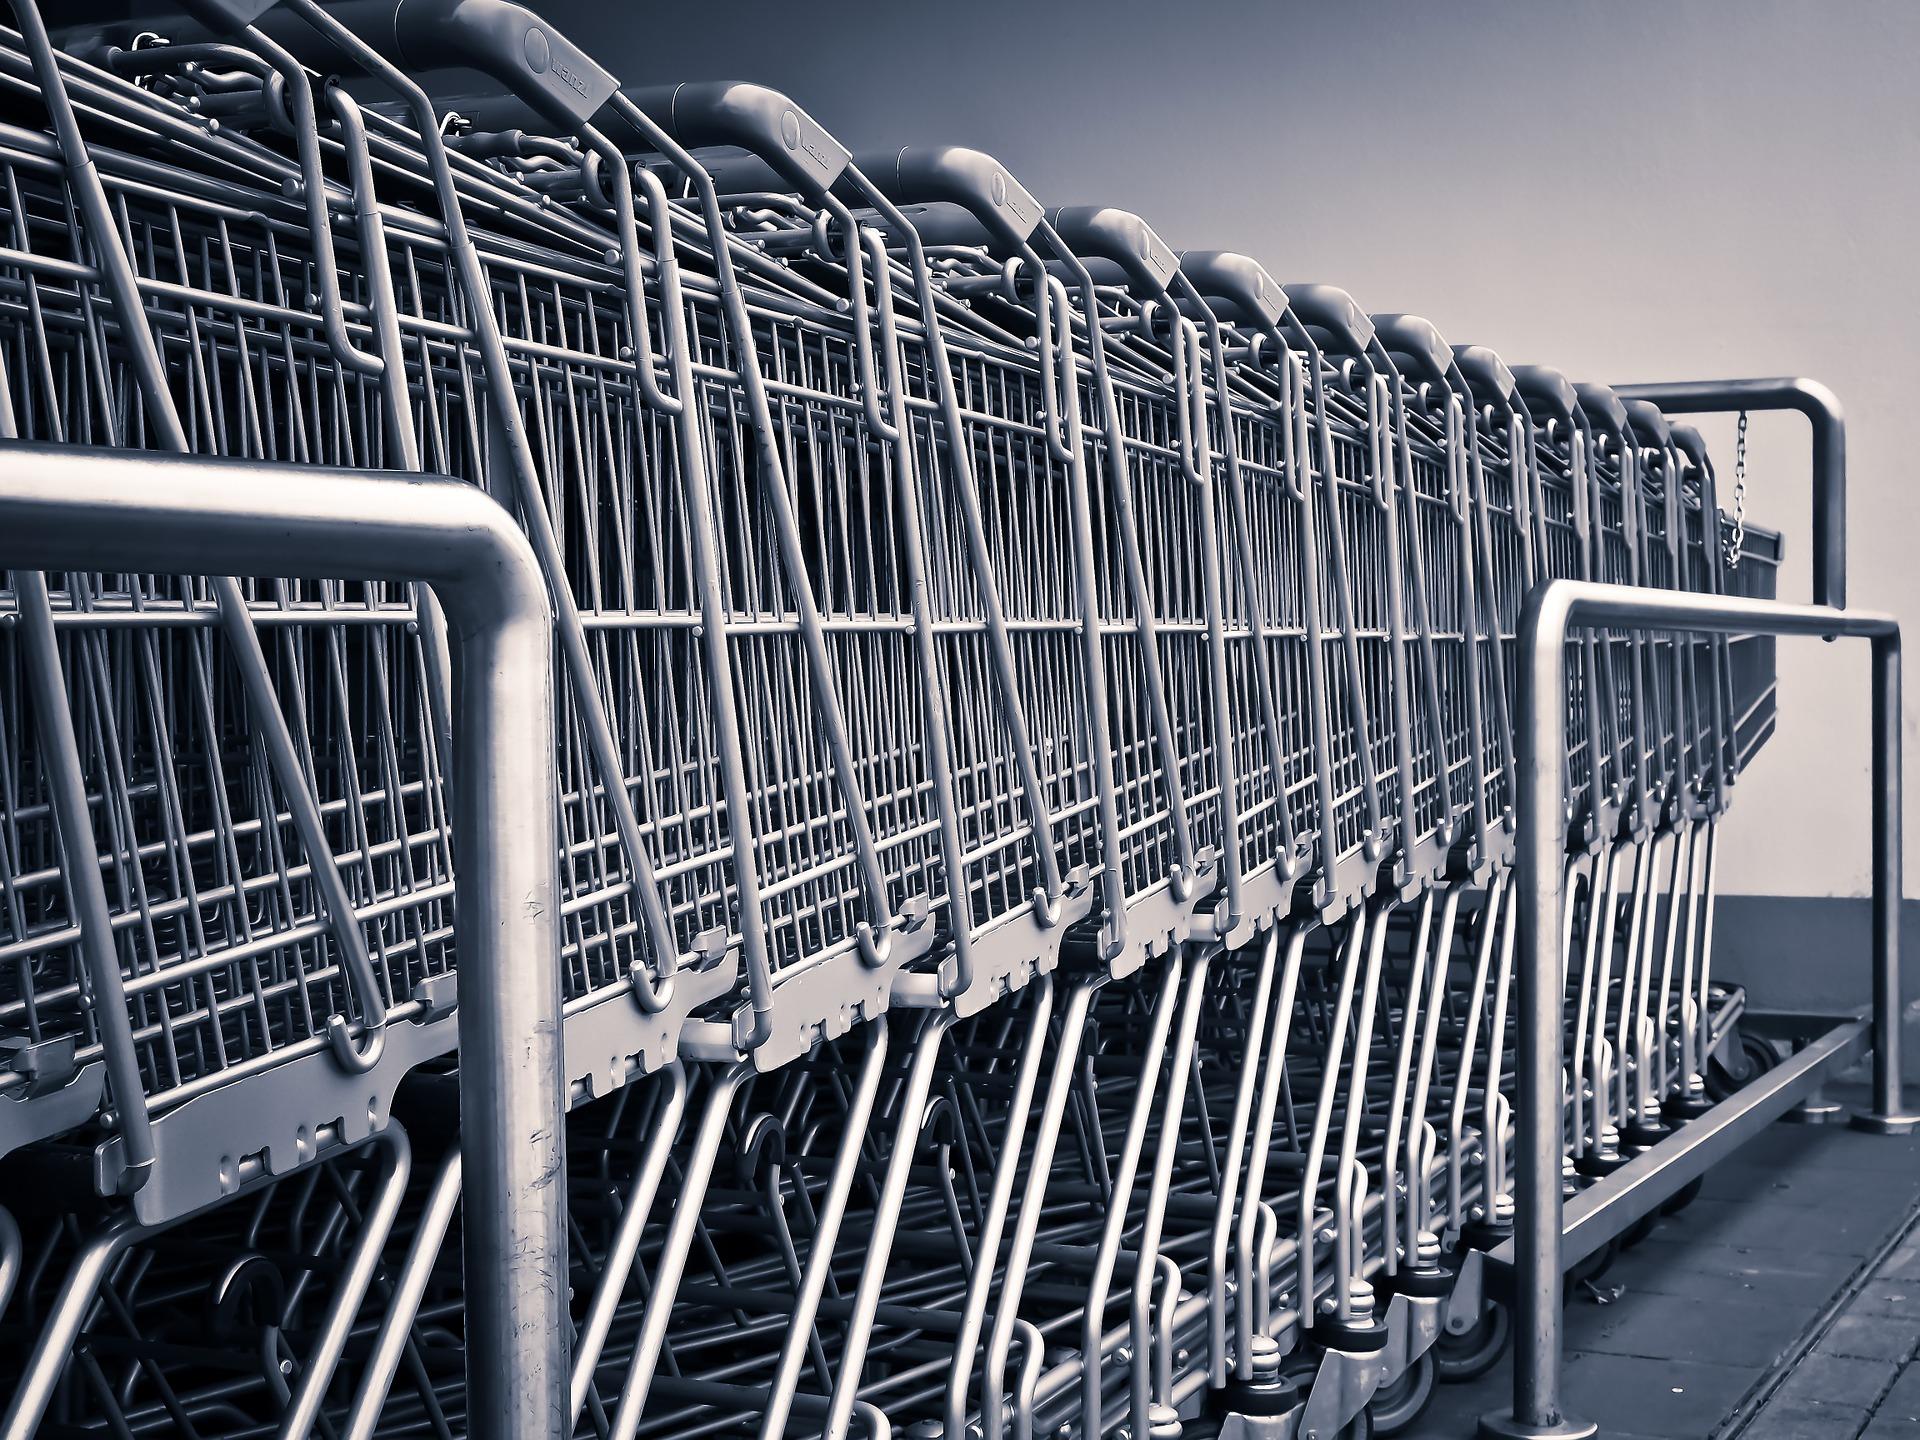 shopping-cart-1275480_1920.jpg